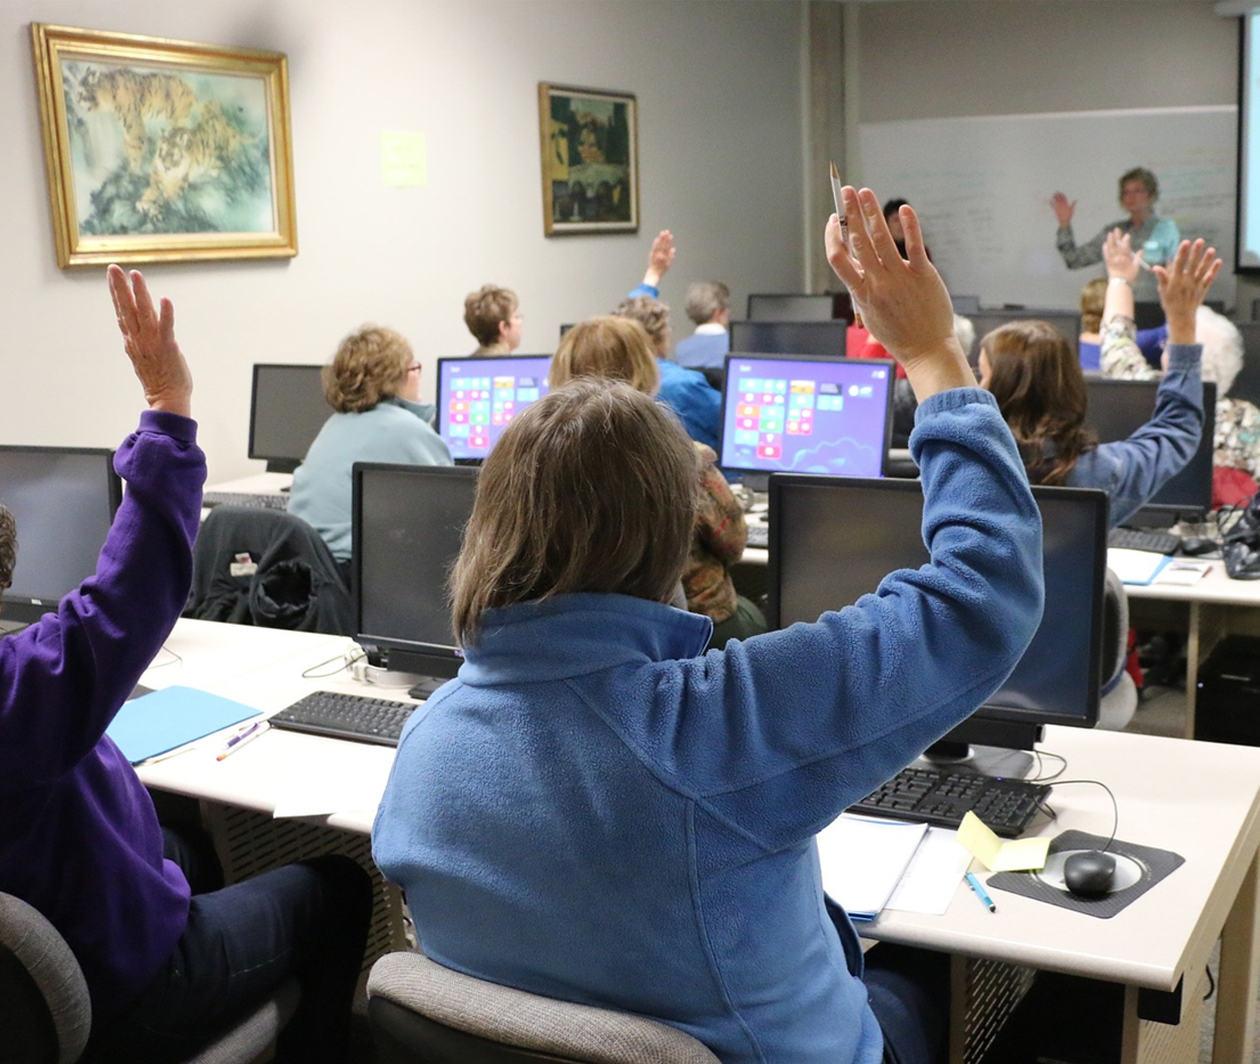 Digital Transformation in the Classroom